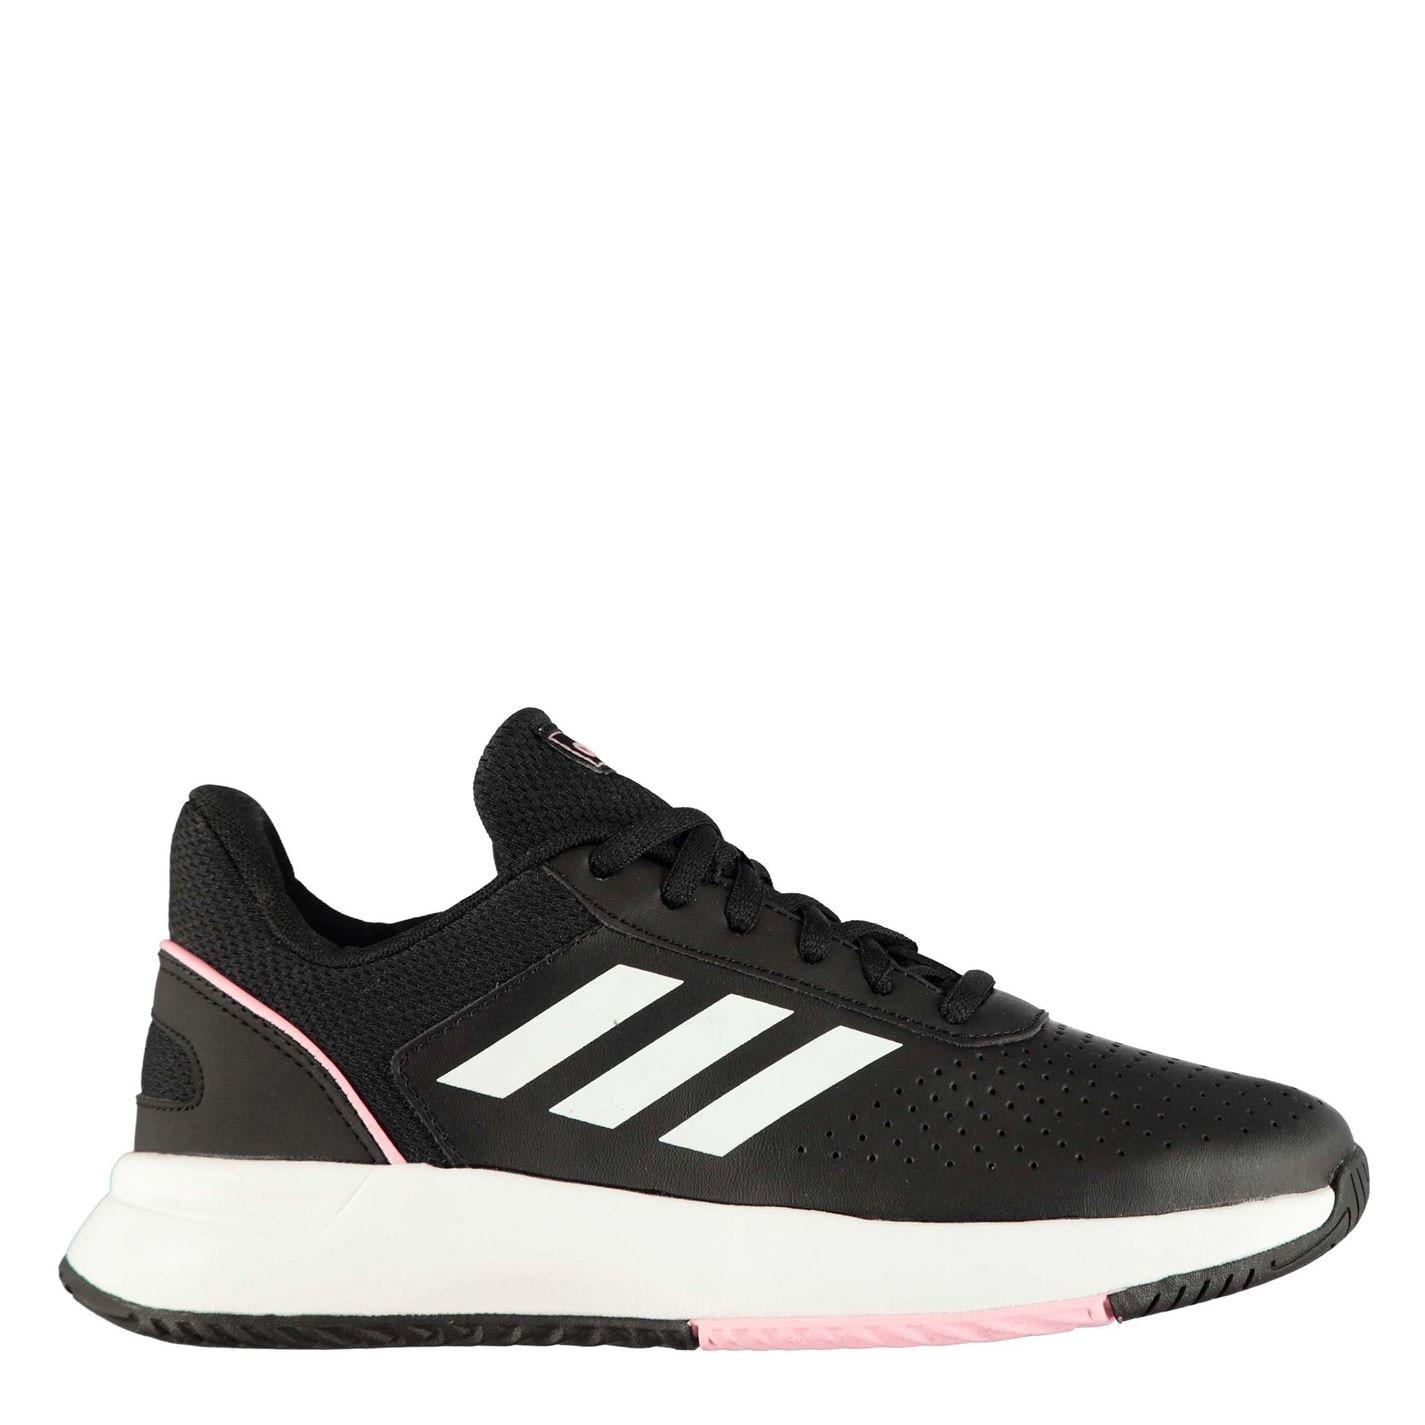 boty adidas Courtsmash Tennis Shoes dámske